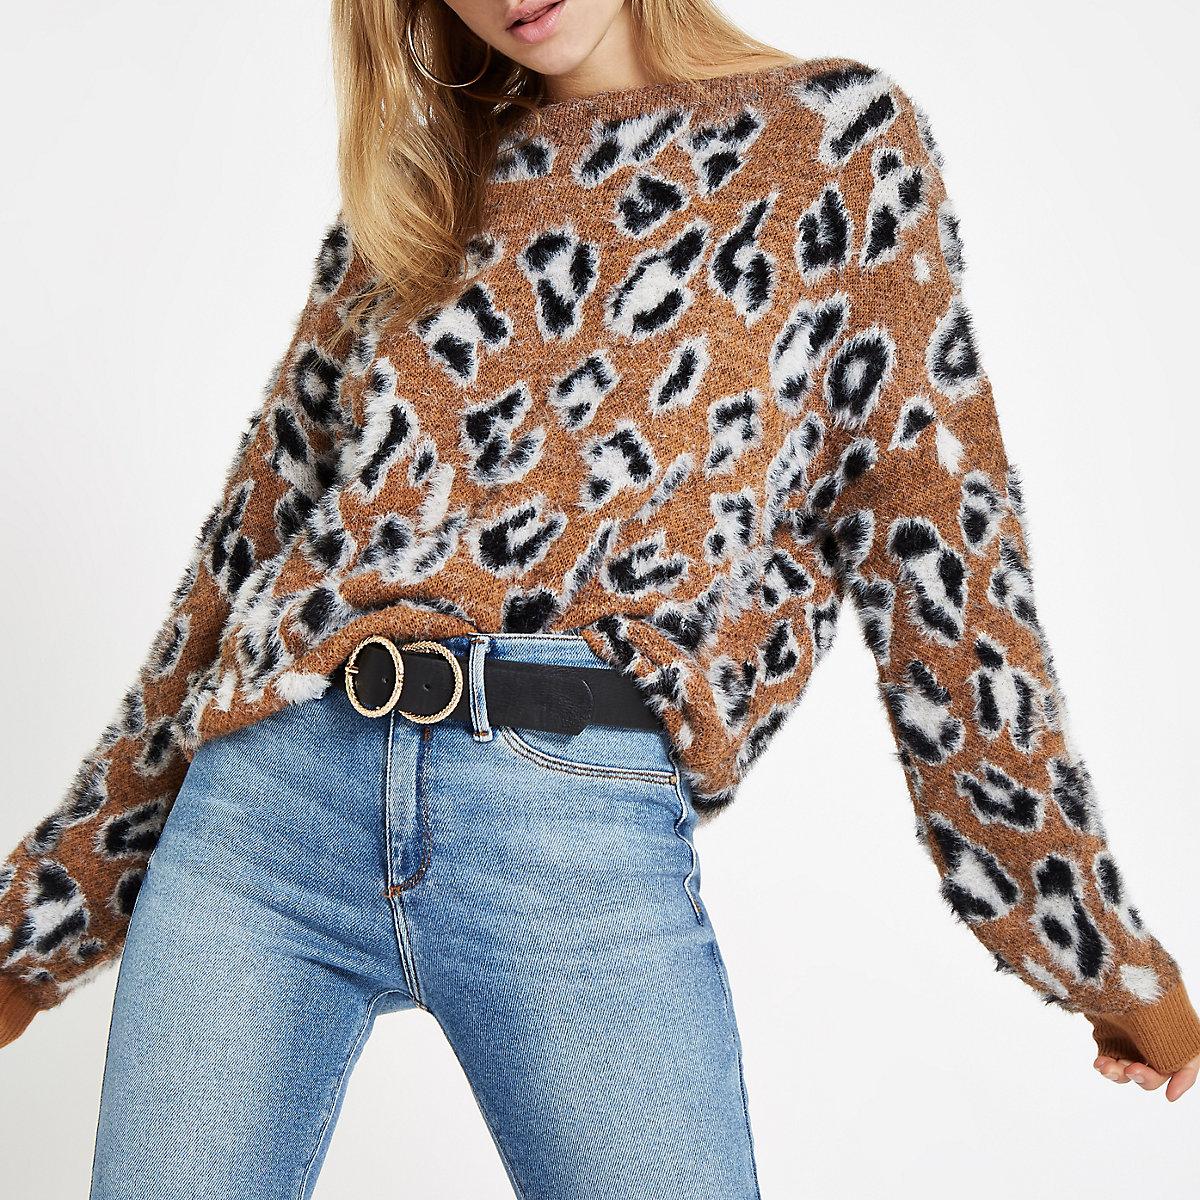 Pull imprimé léopard marron avec col fendu